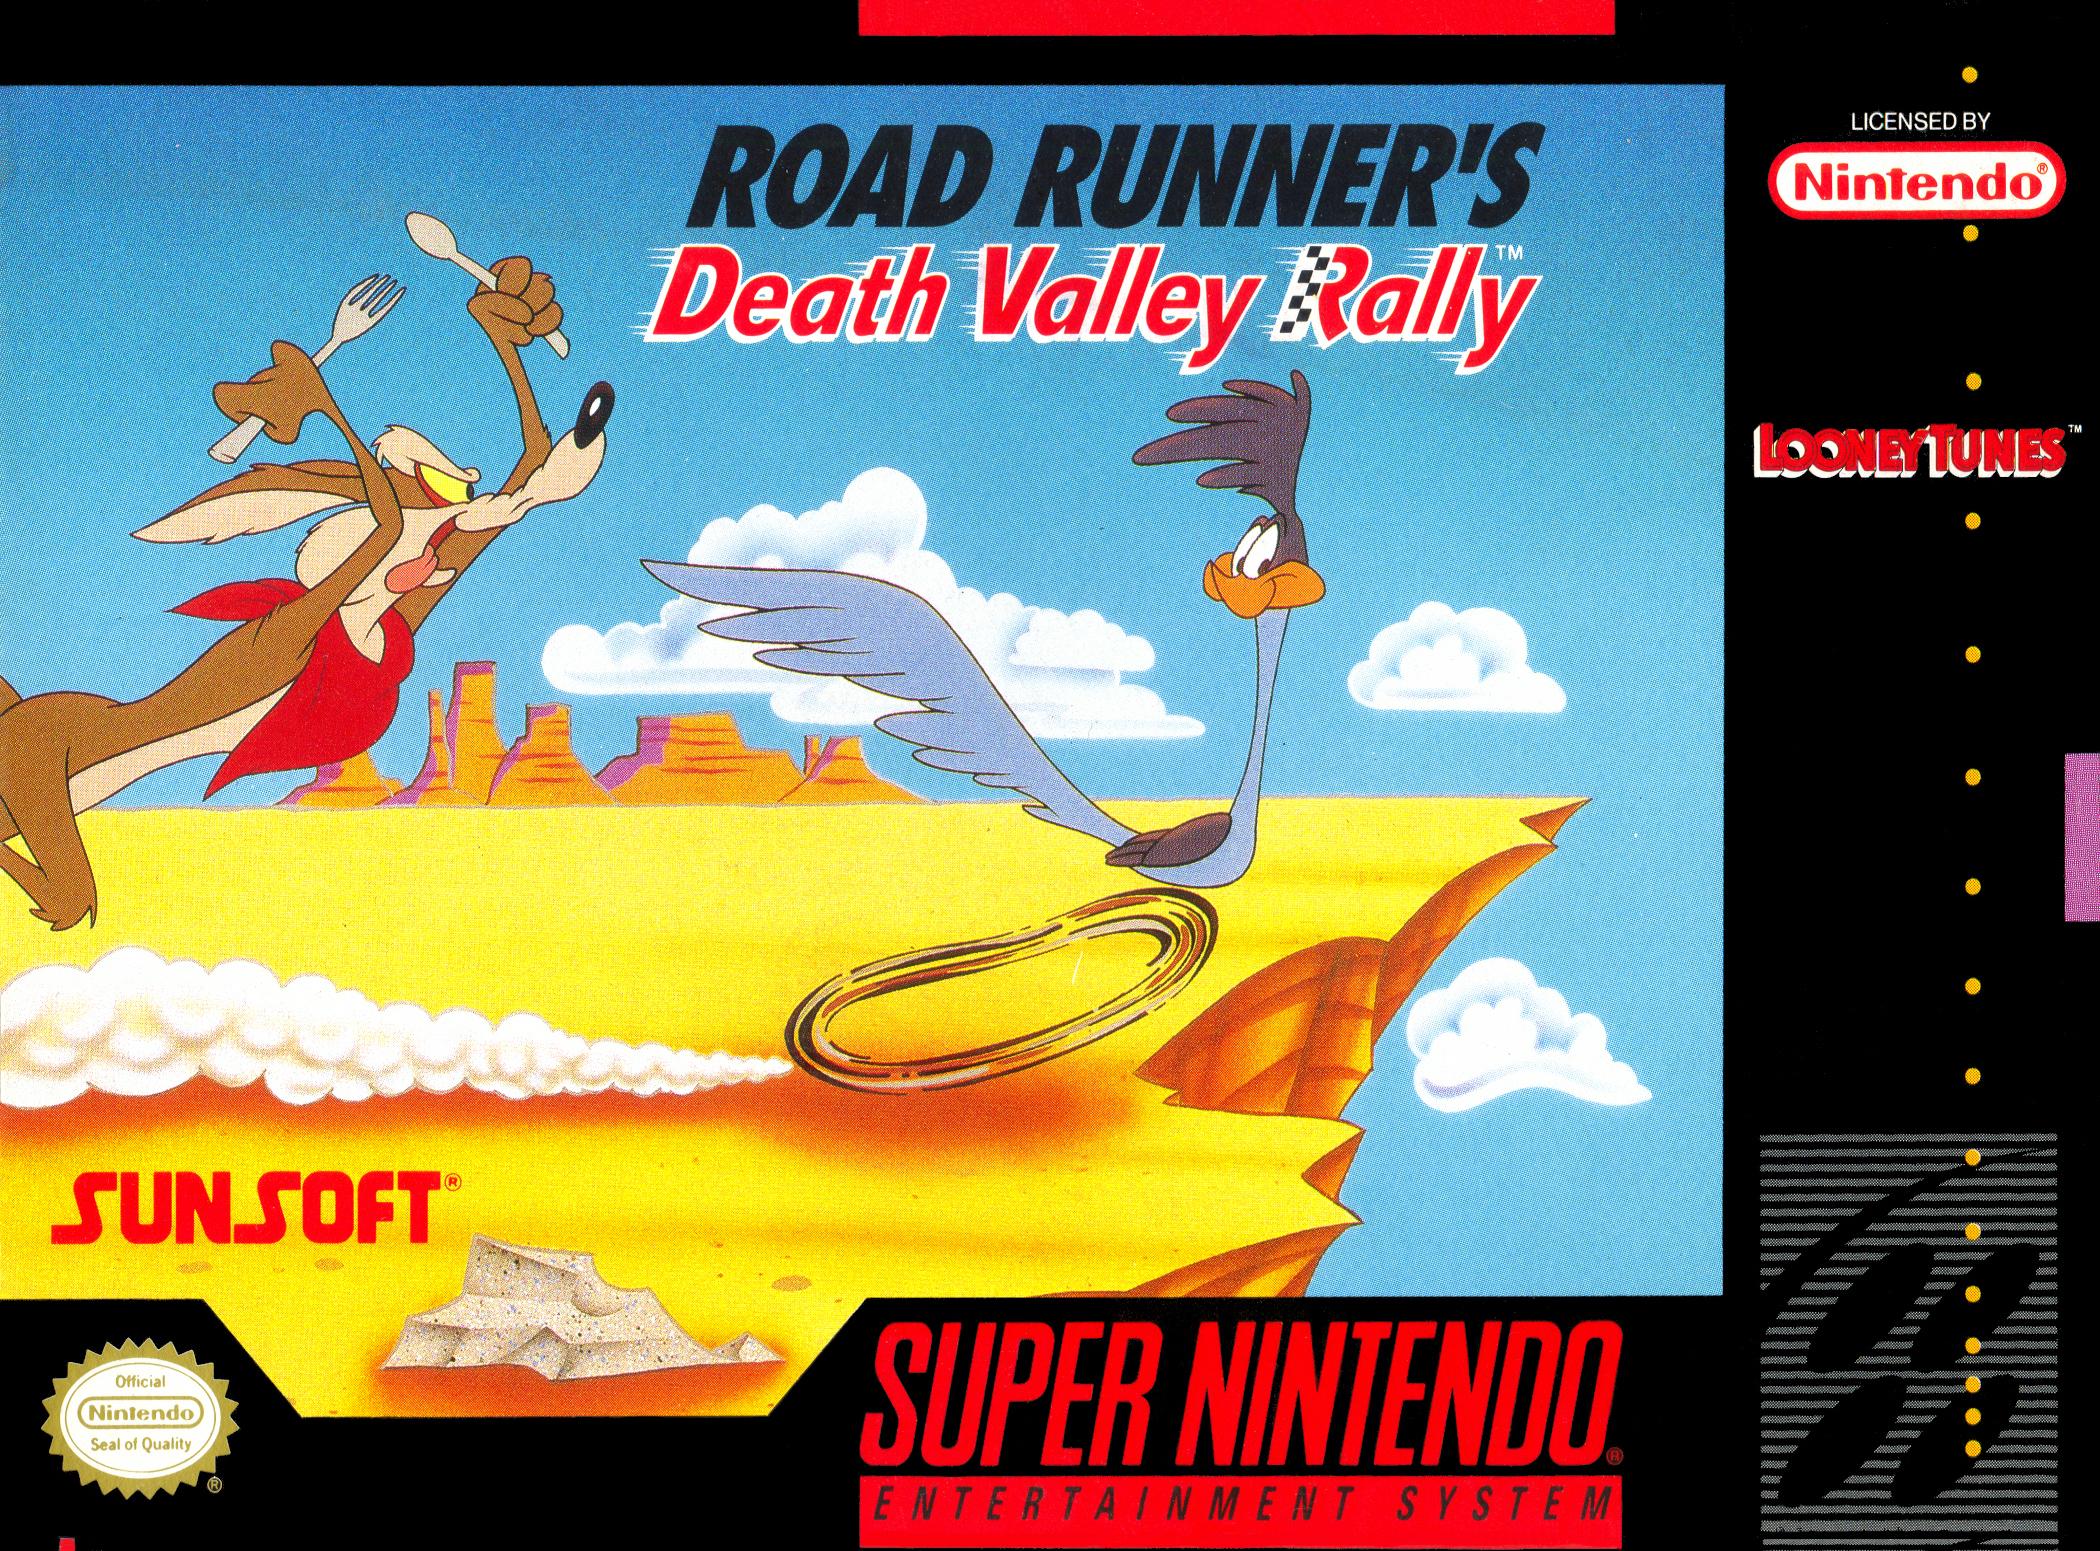 Road Runner's Death Valley Rally (SNES)